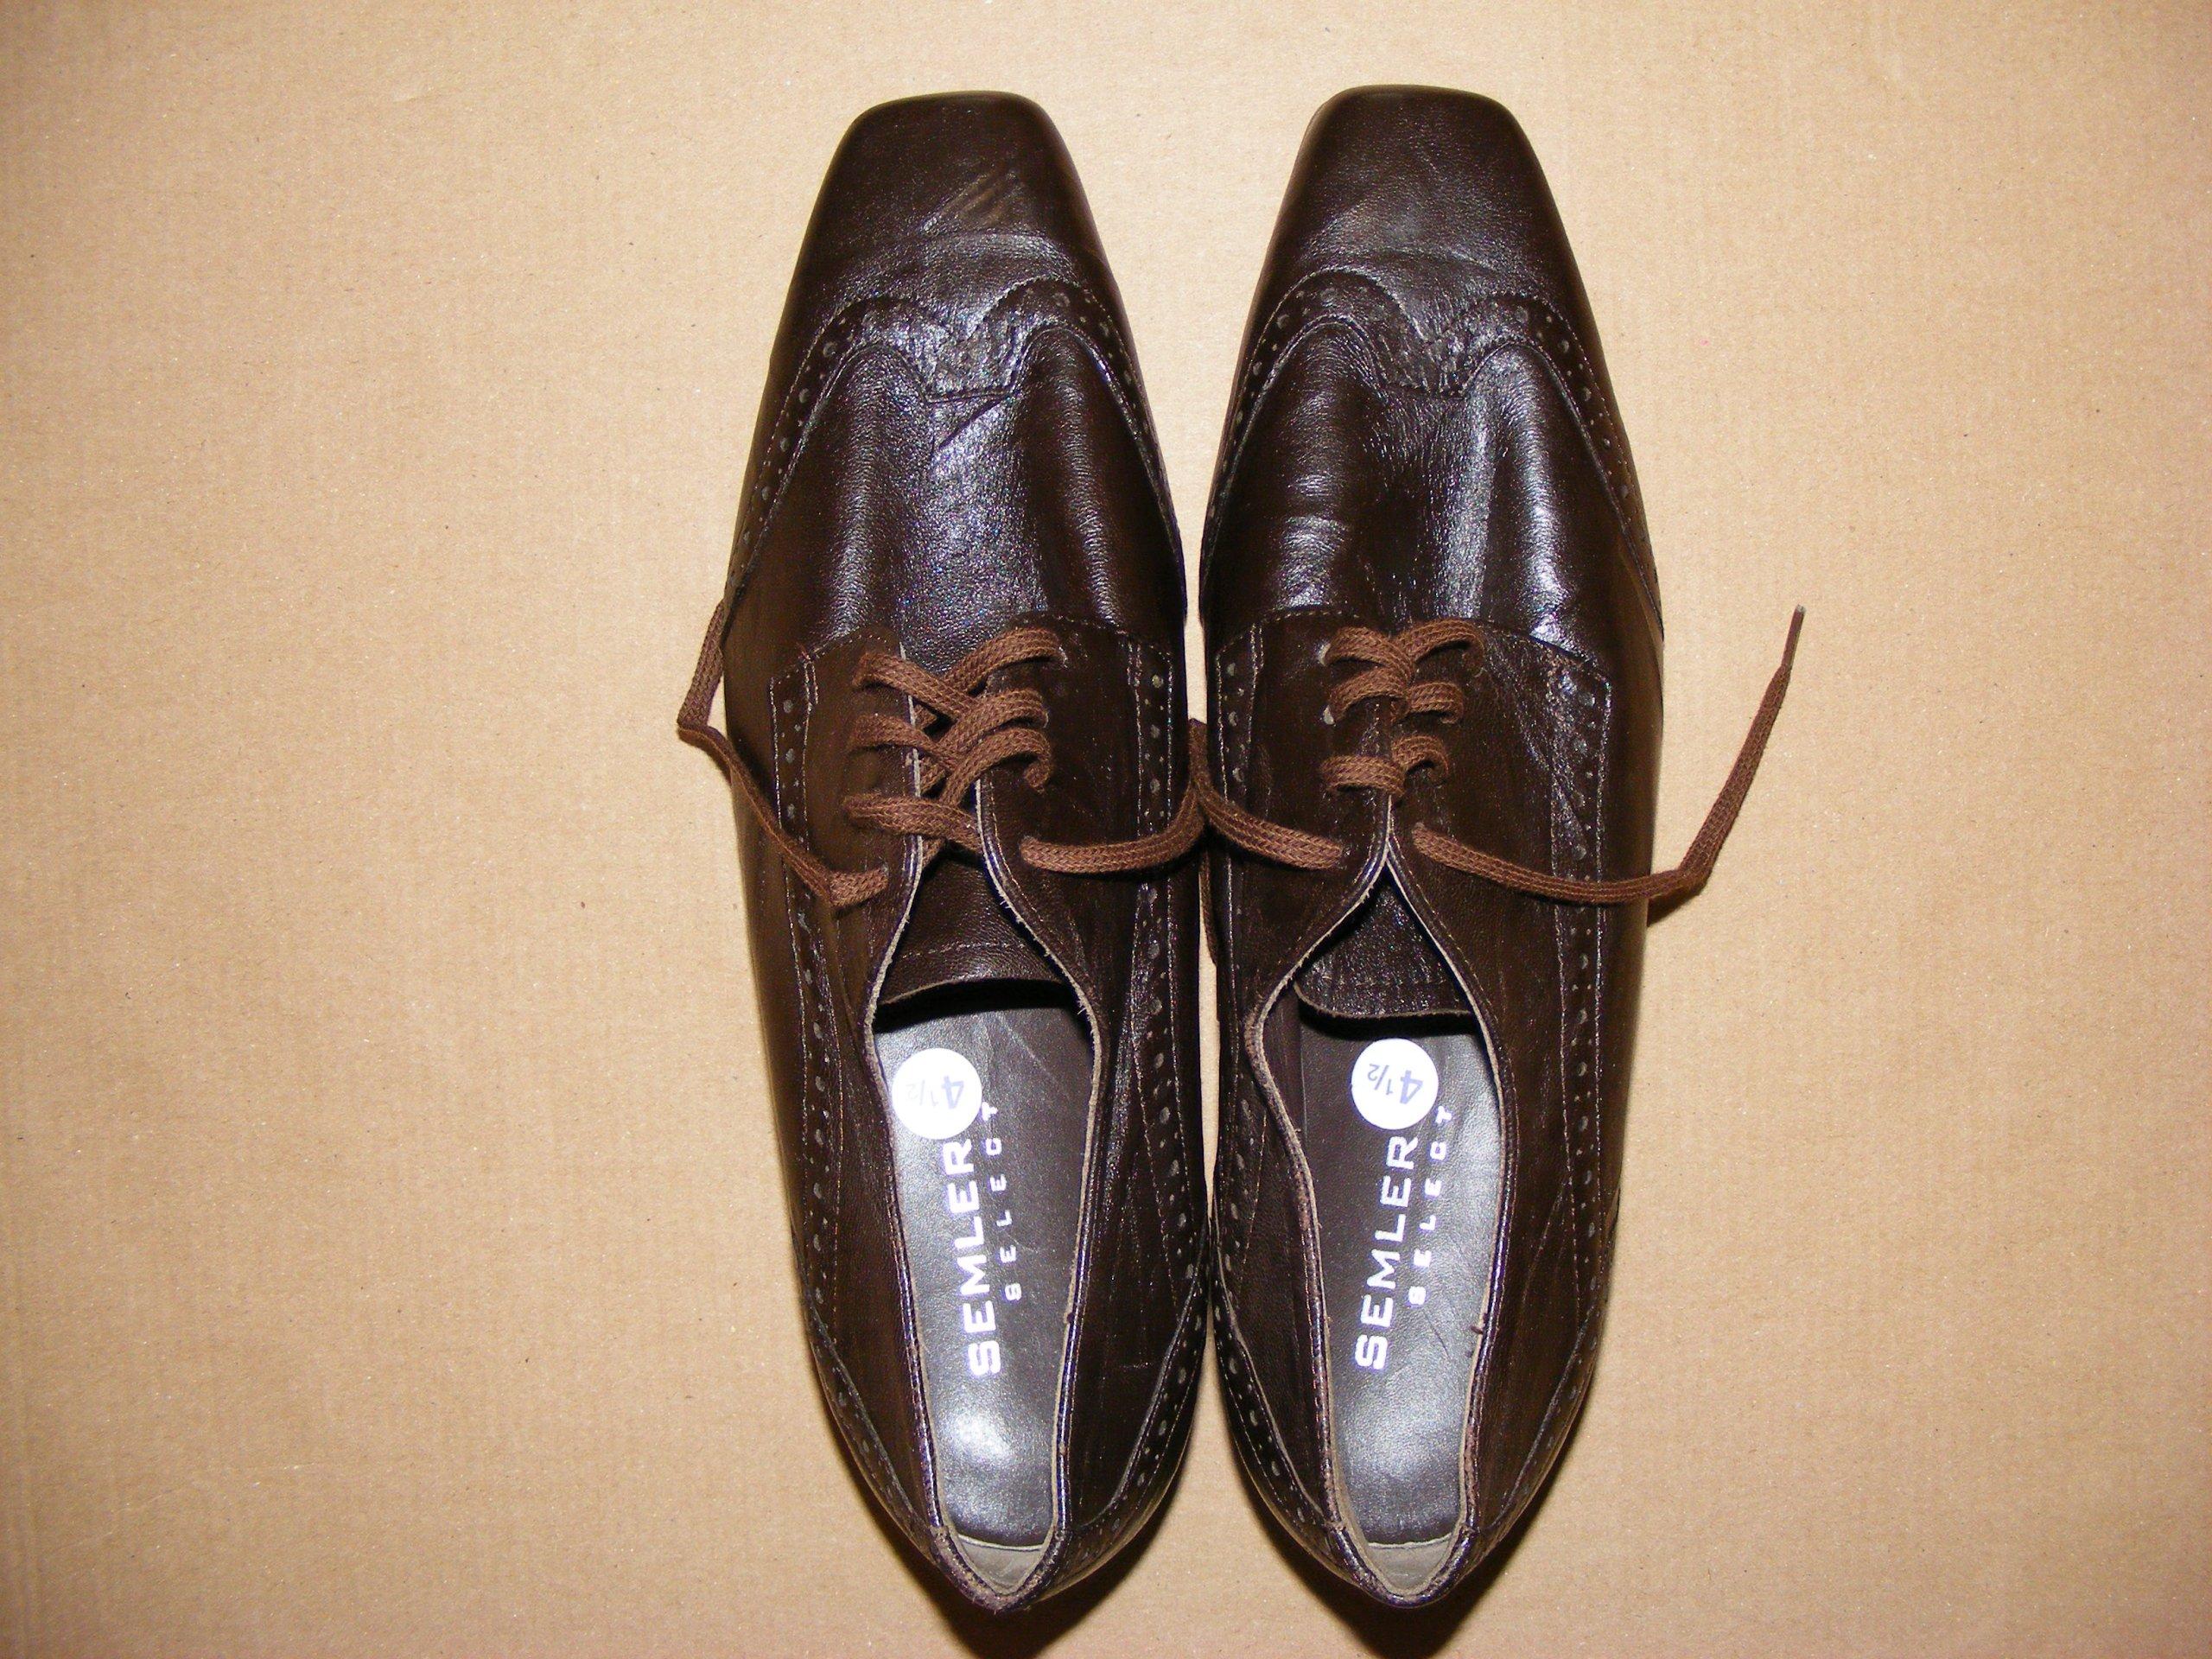 WYPRZEDAŻ SEMLER buty, skóra nat 37,5 jNOWE